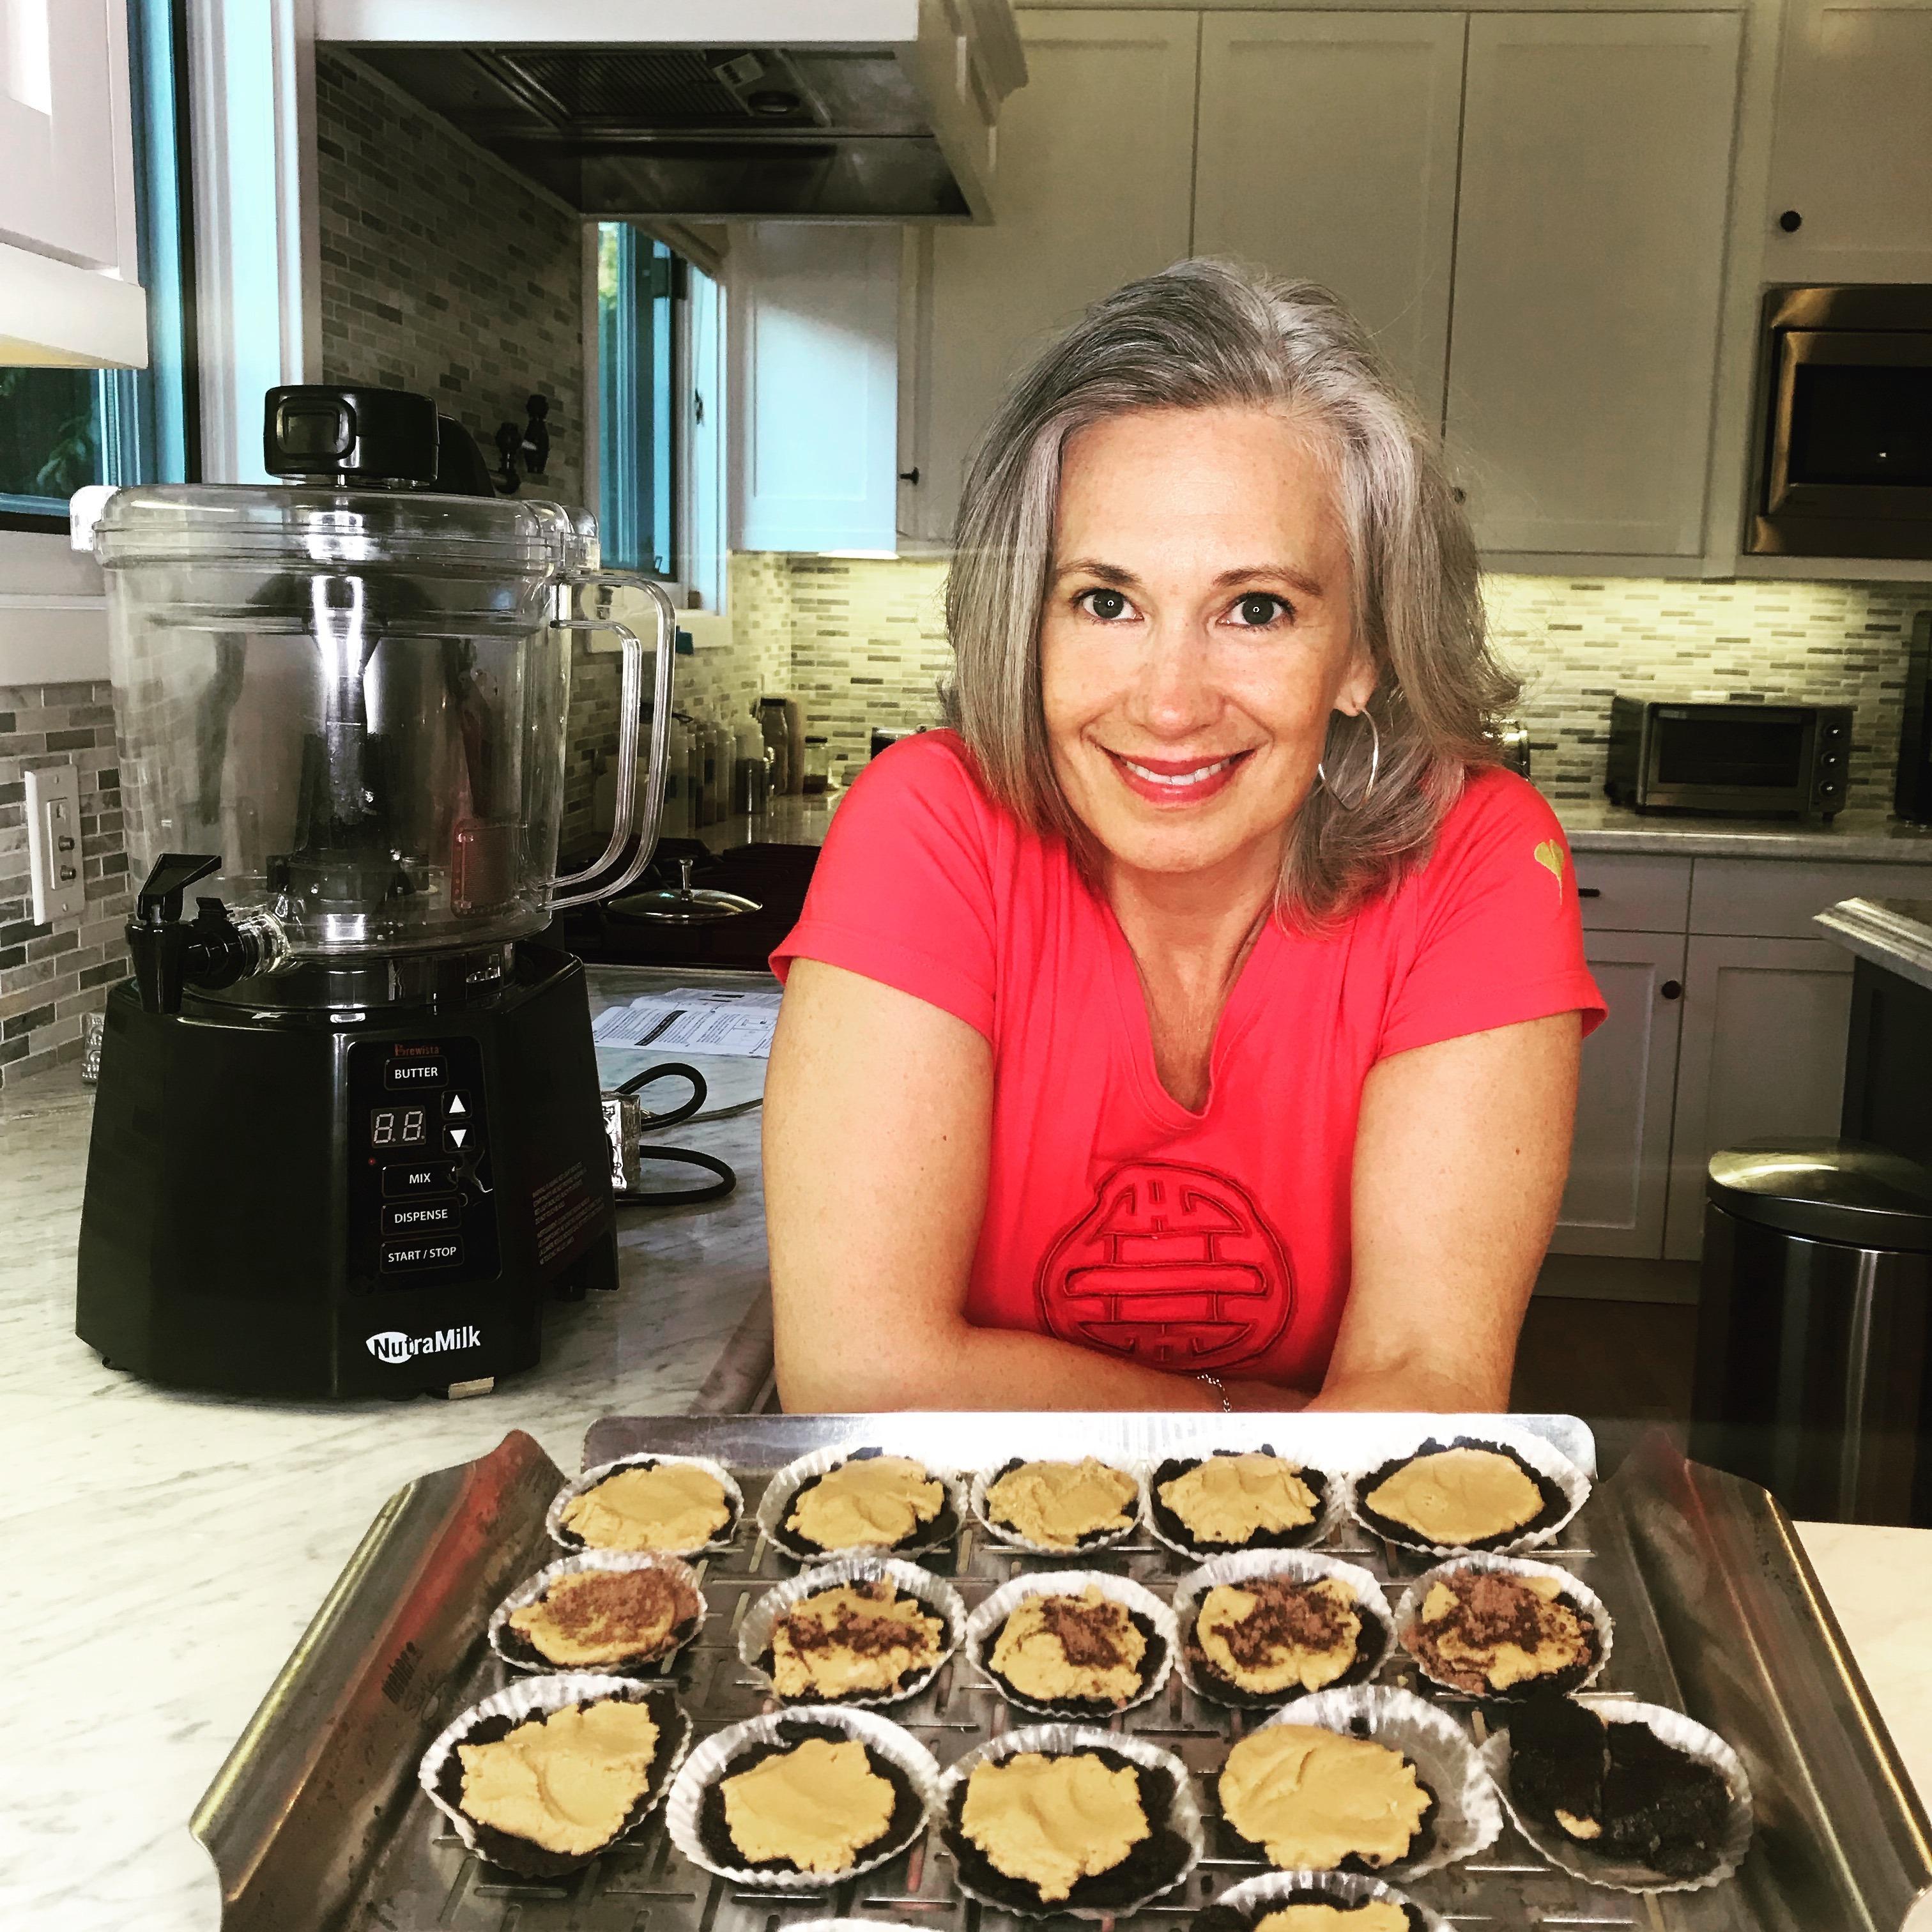 Elysabeth Alfano making Vegan Peanut Butter Chocolate Oreo Cookies